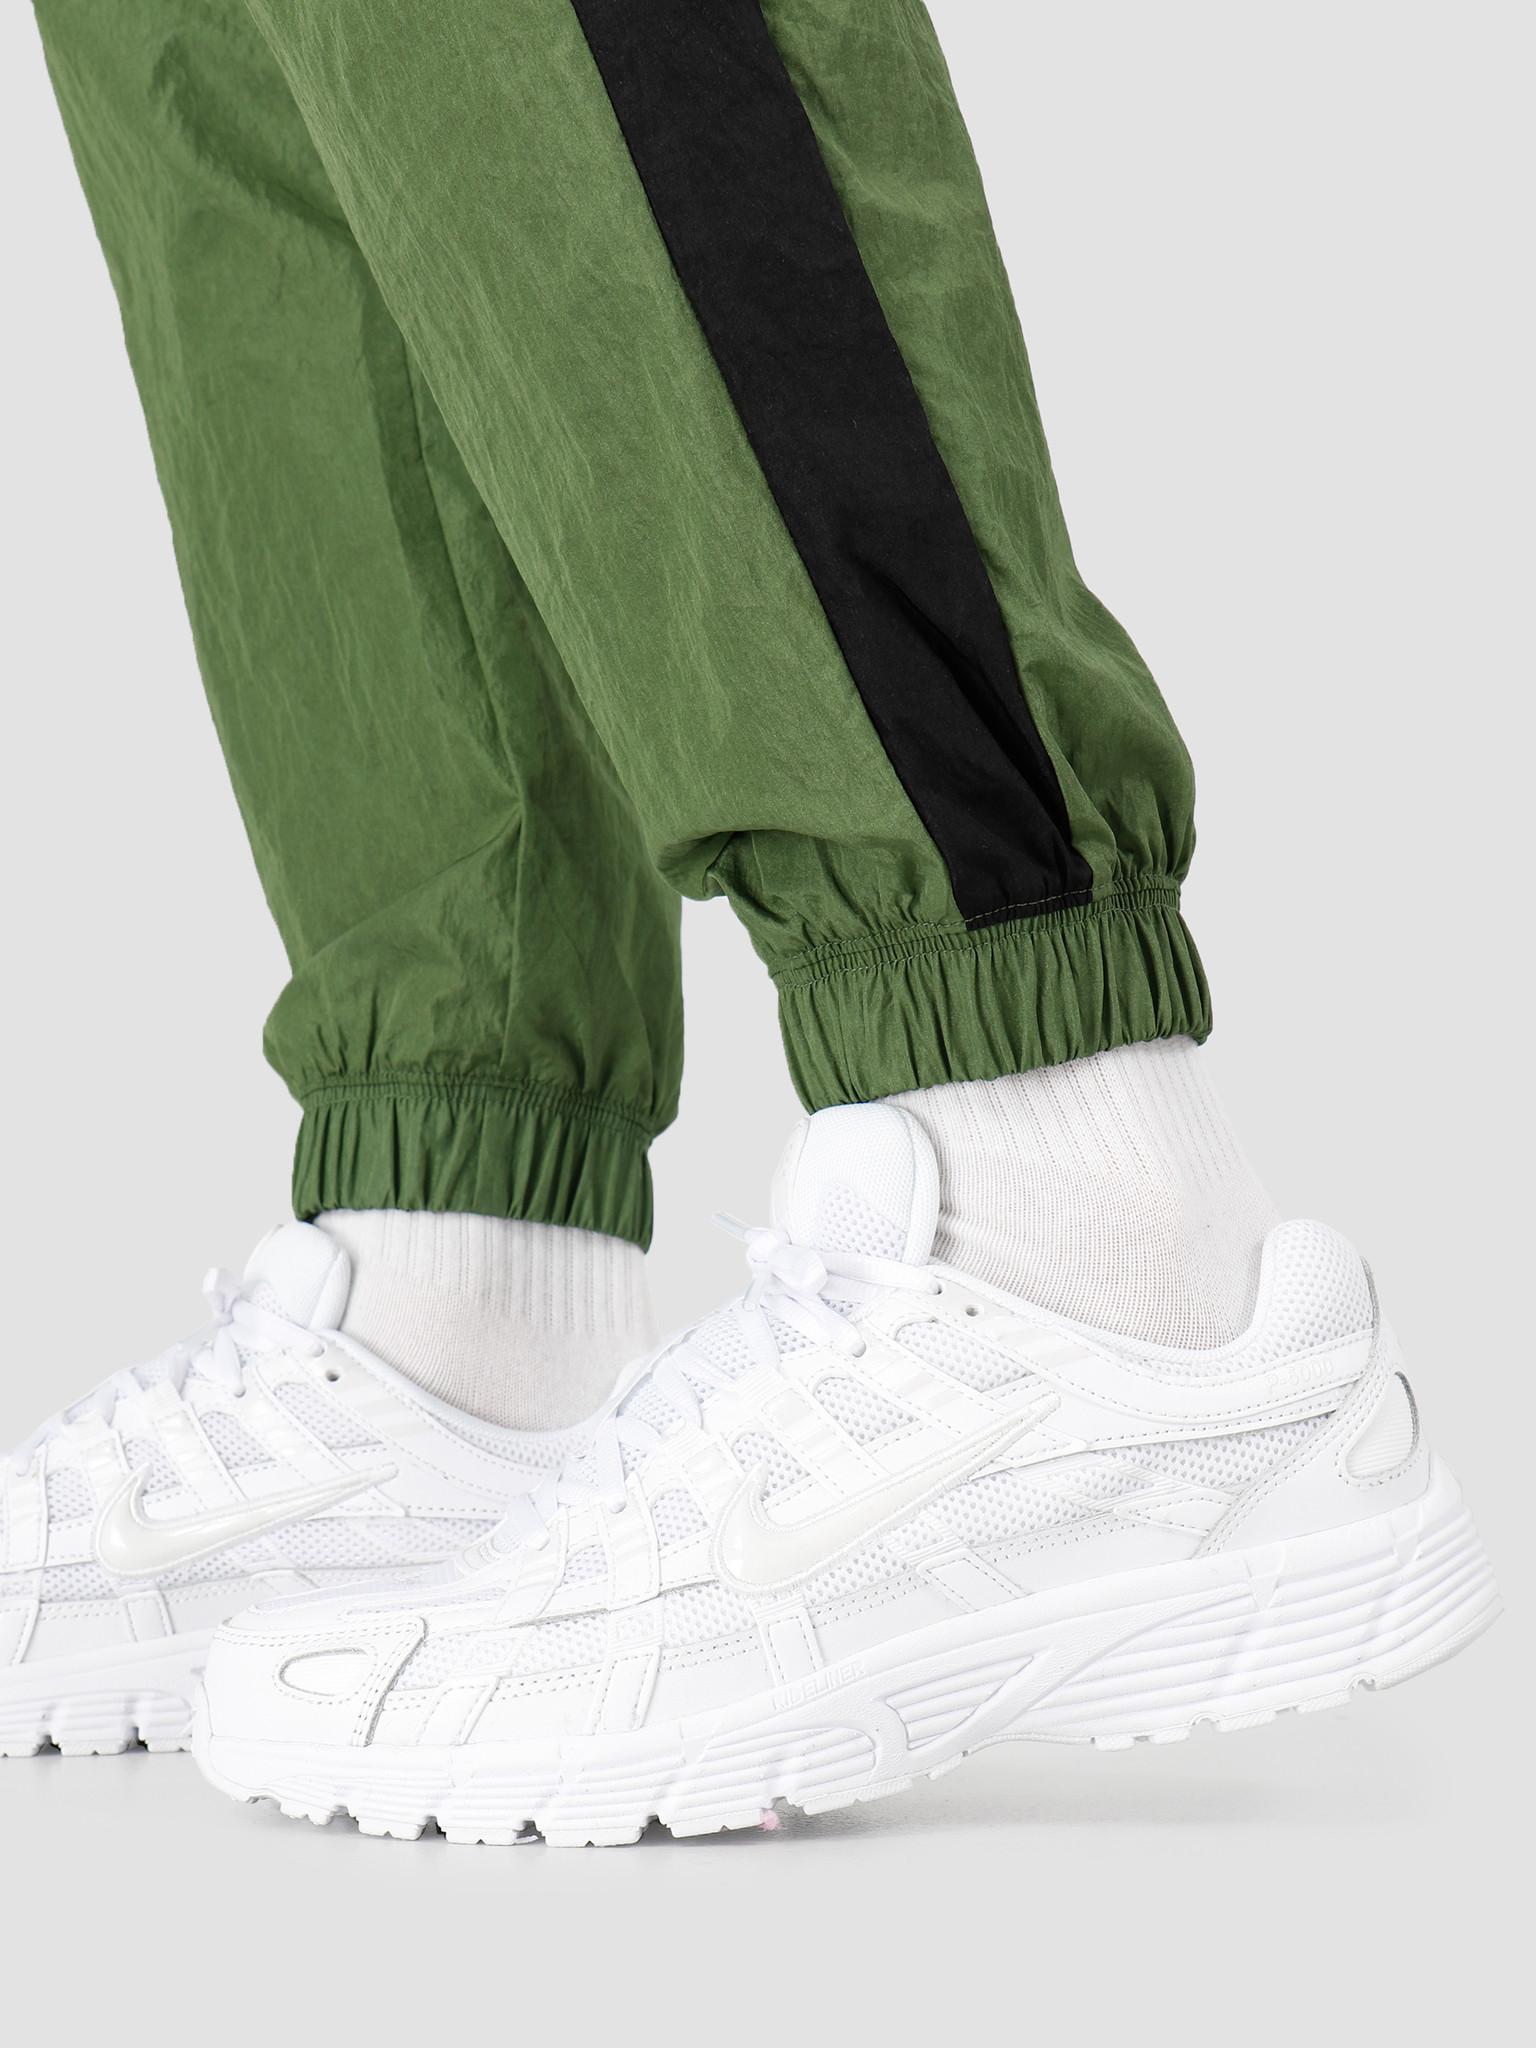 Nike Nike NSW Swoosh Pant Woven Treeline Black White CJ4877-326